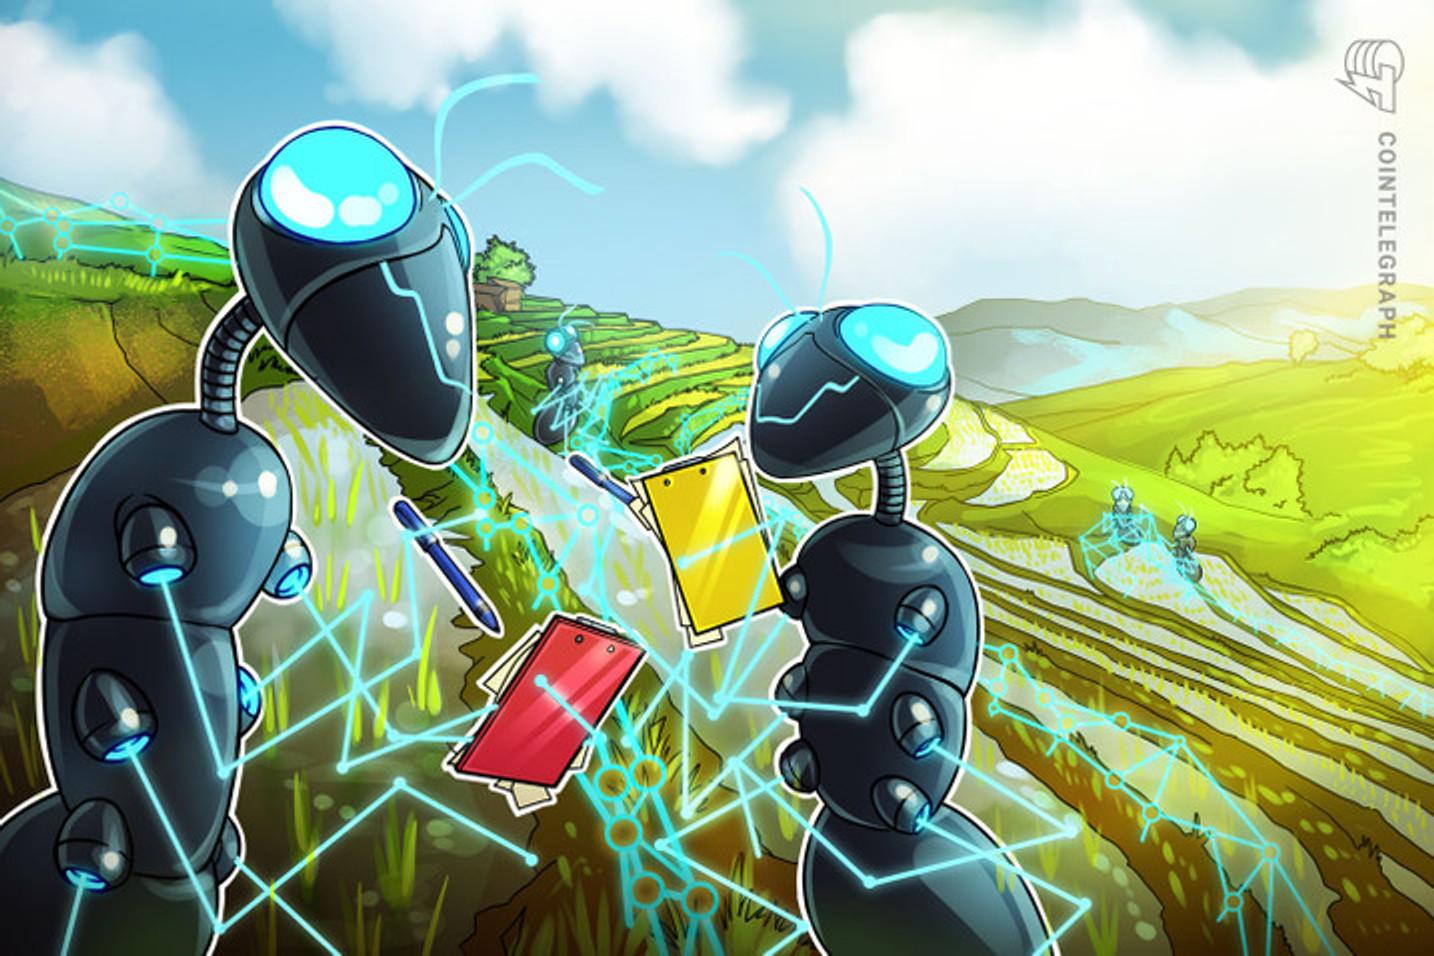 Bunge e Cargill se unem para lançar plataforma em blockchain para agricultura no Brasil